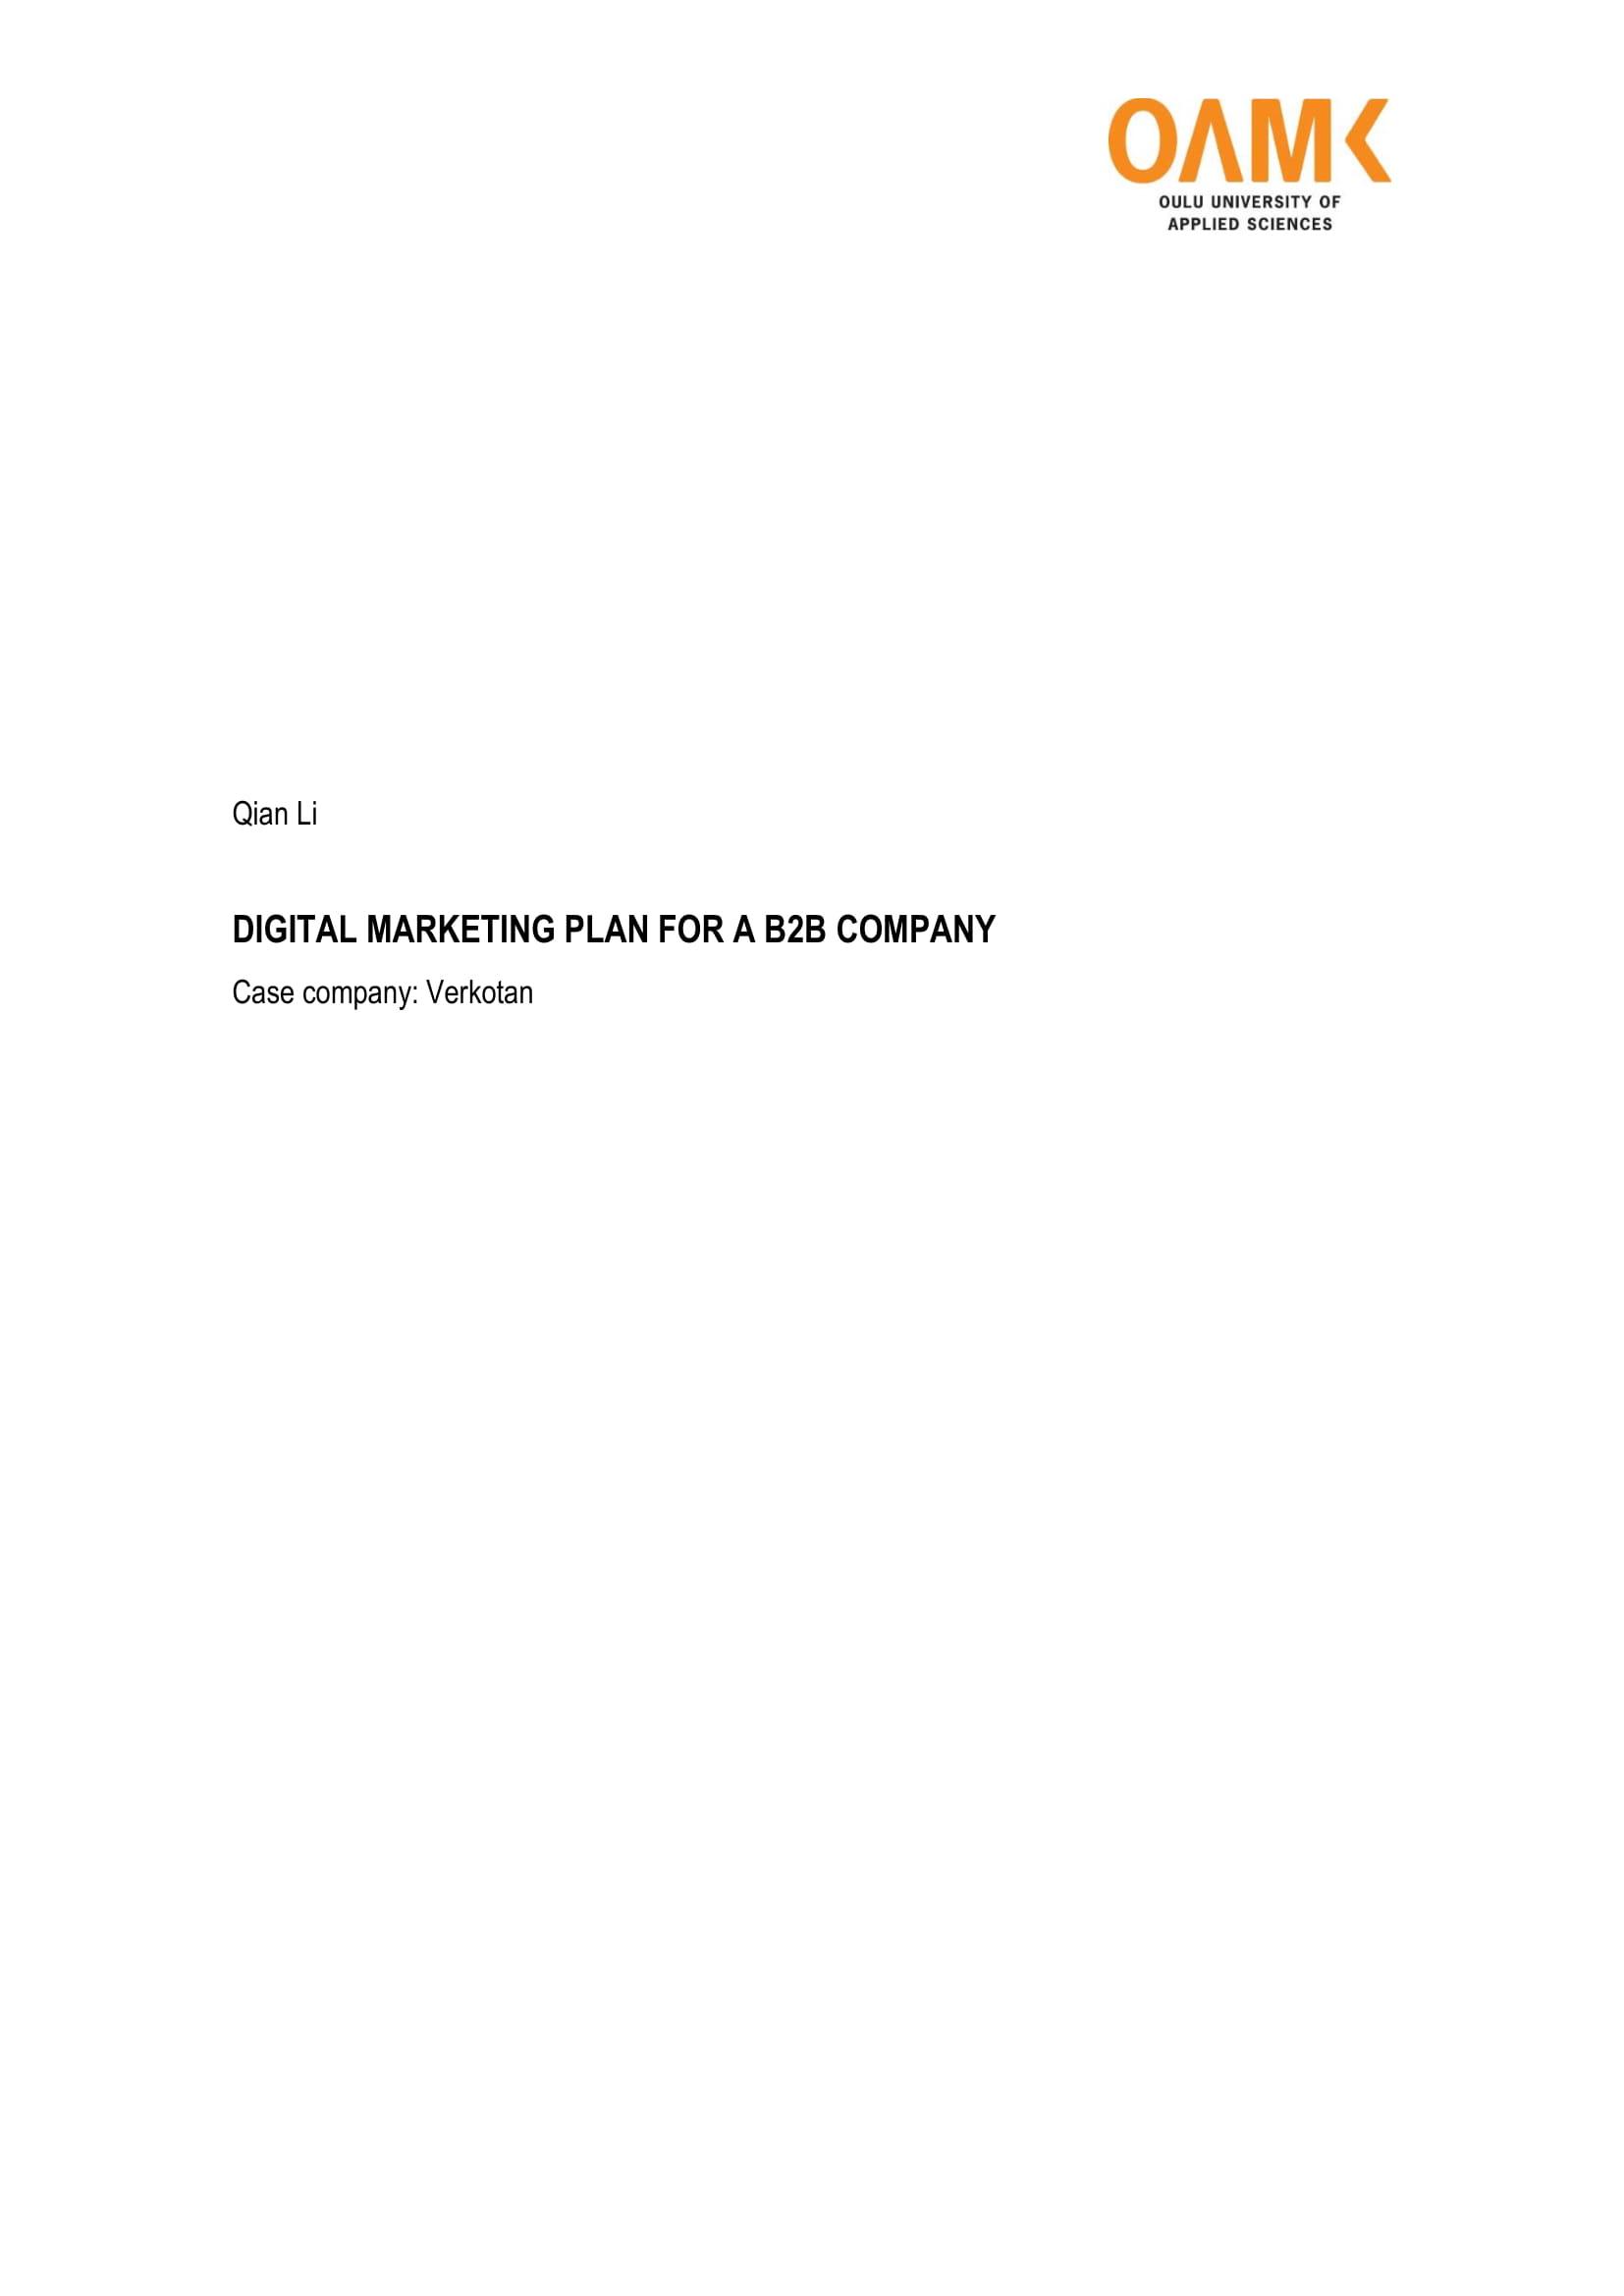 digital marketing plan with social media strategic usage for a b2b company 01